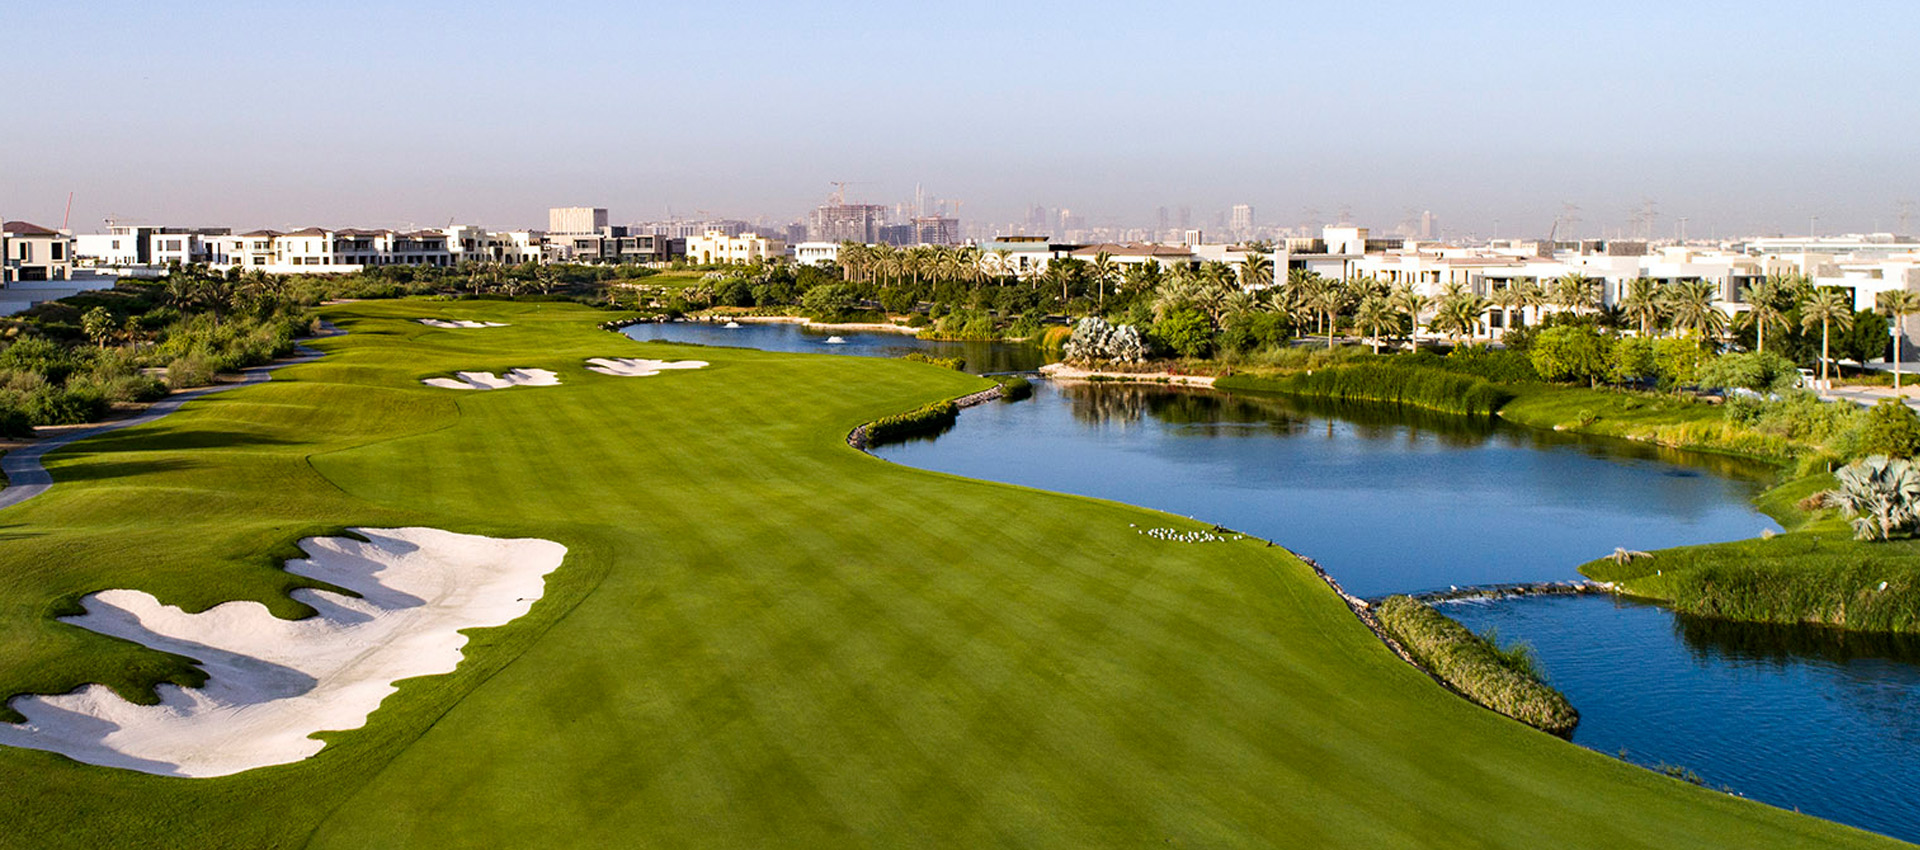 Dubai hills golf course constructed by Desert Group